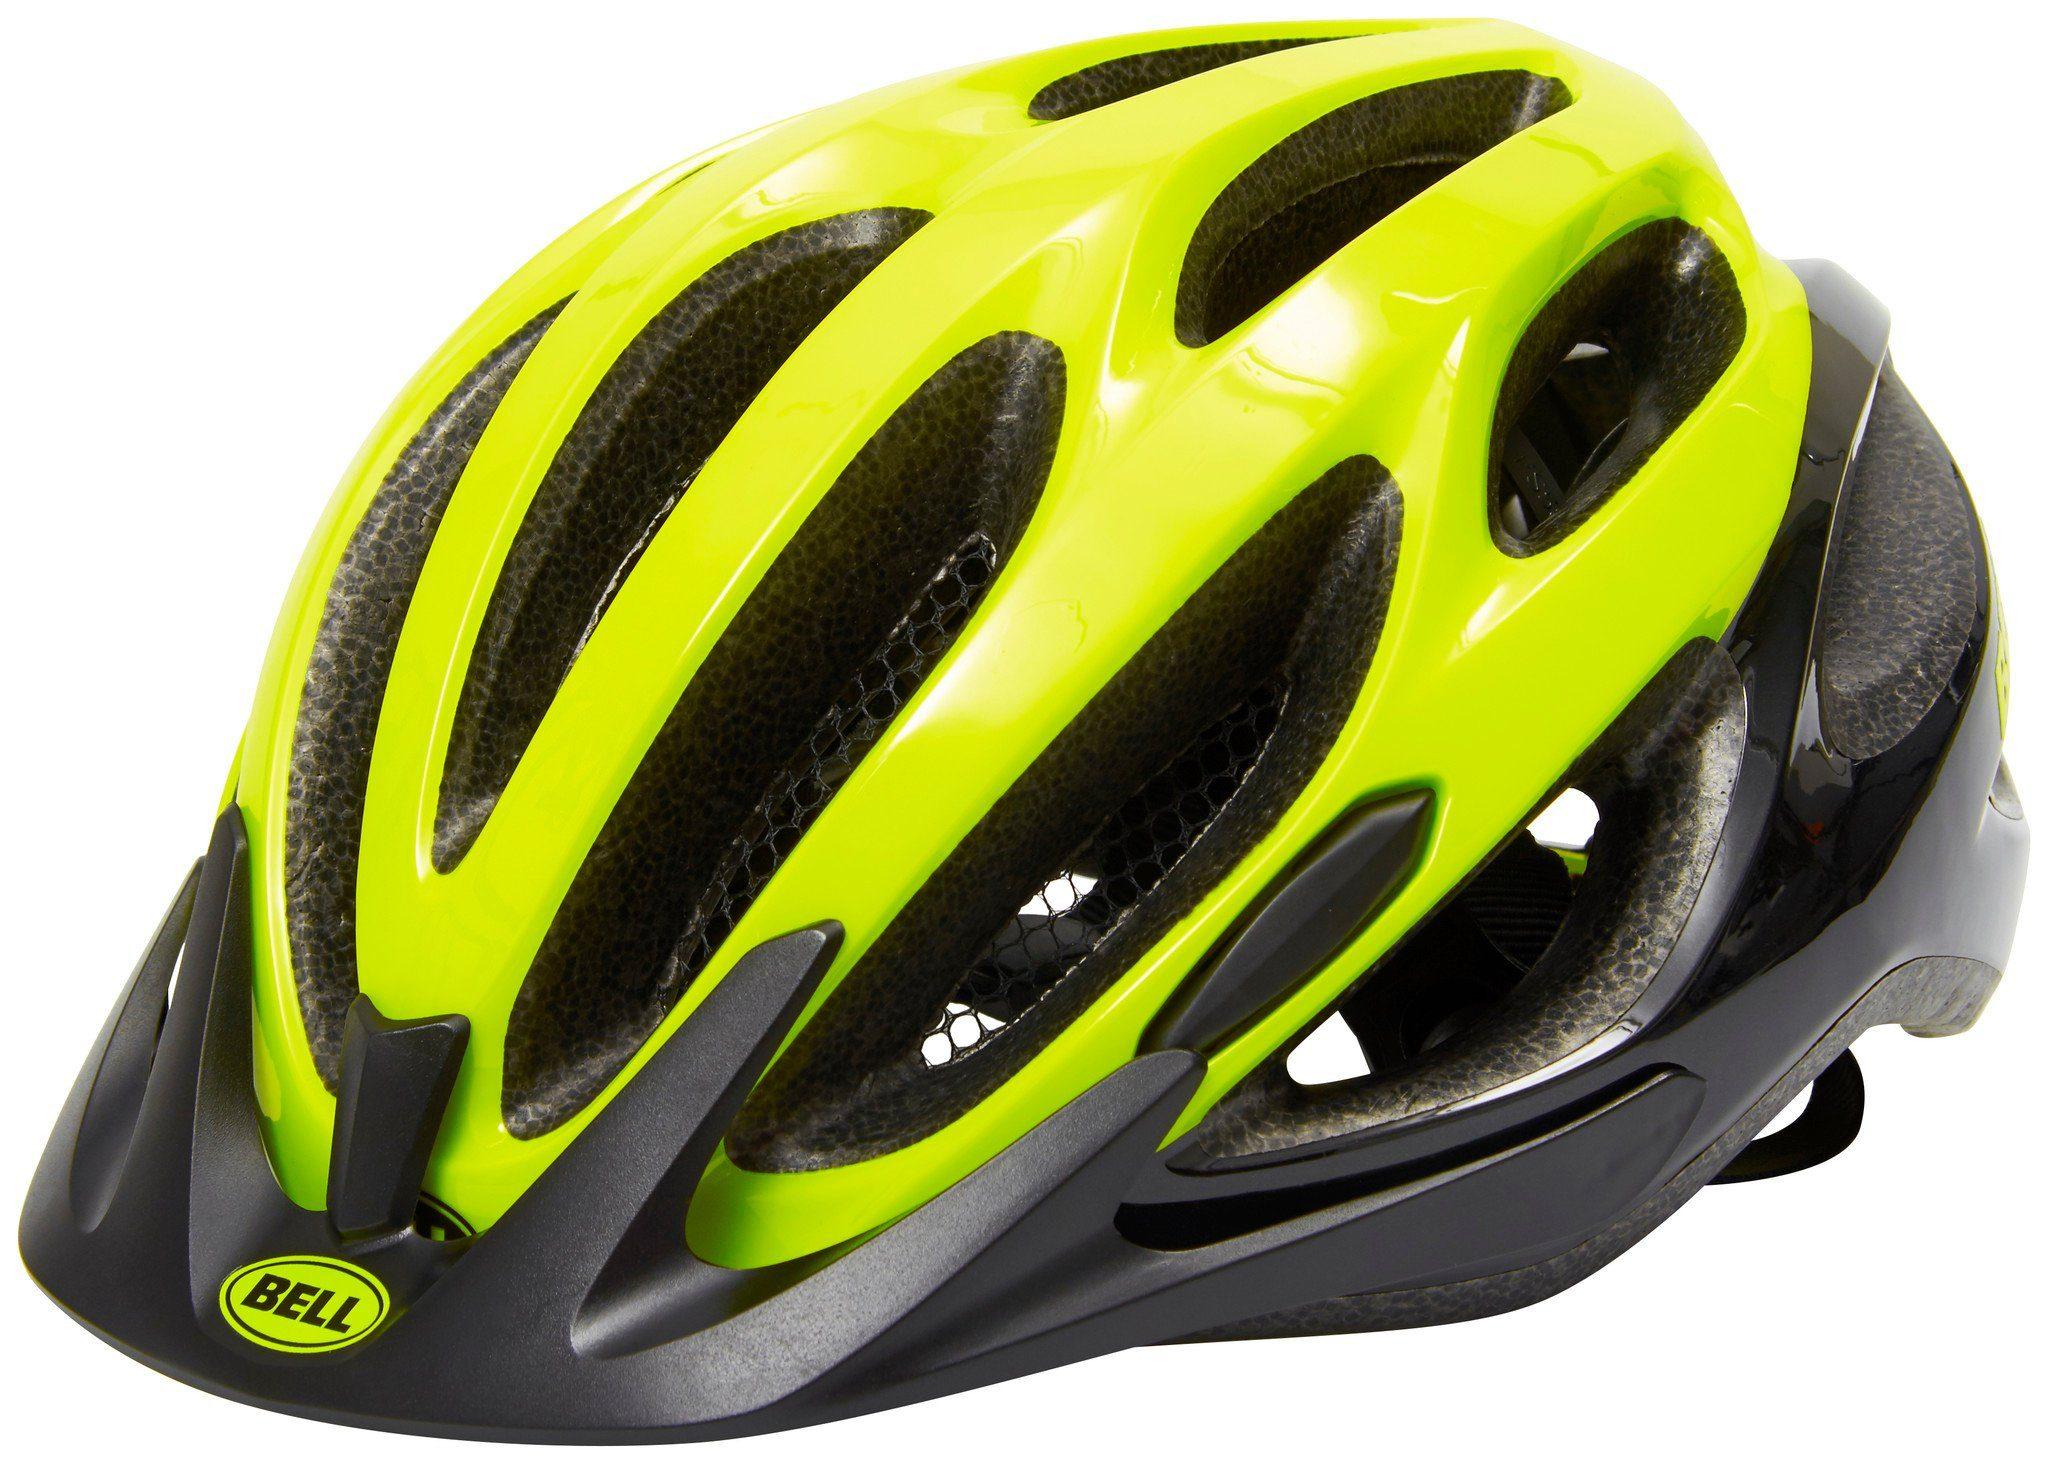 Bell Fahrradhelm »Traverse Helmet«